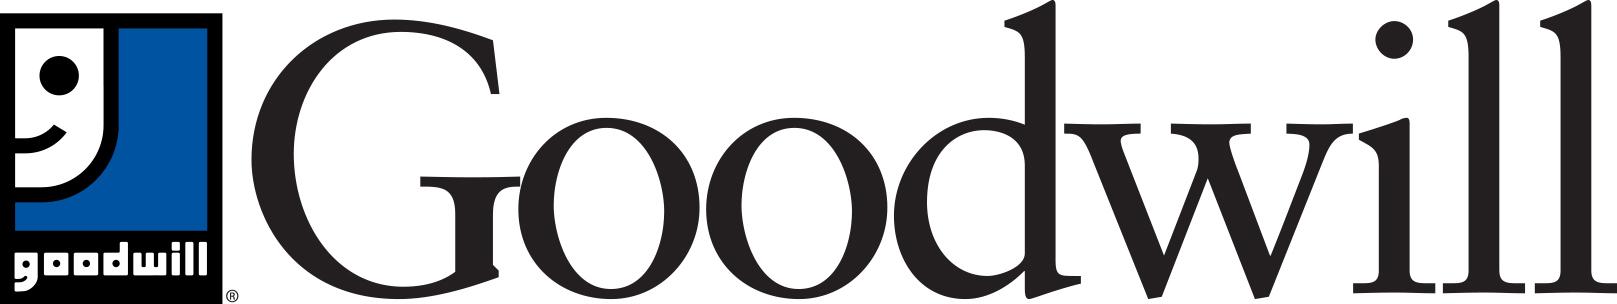 Copy-of-Goodwill_logo